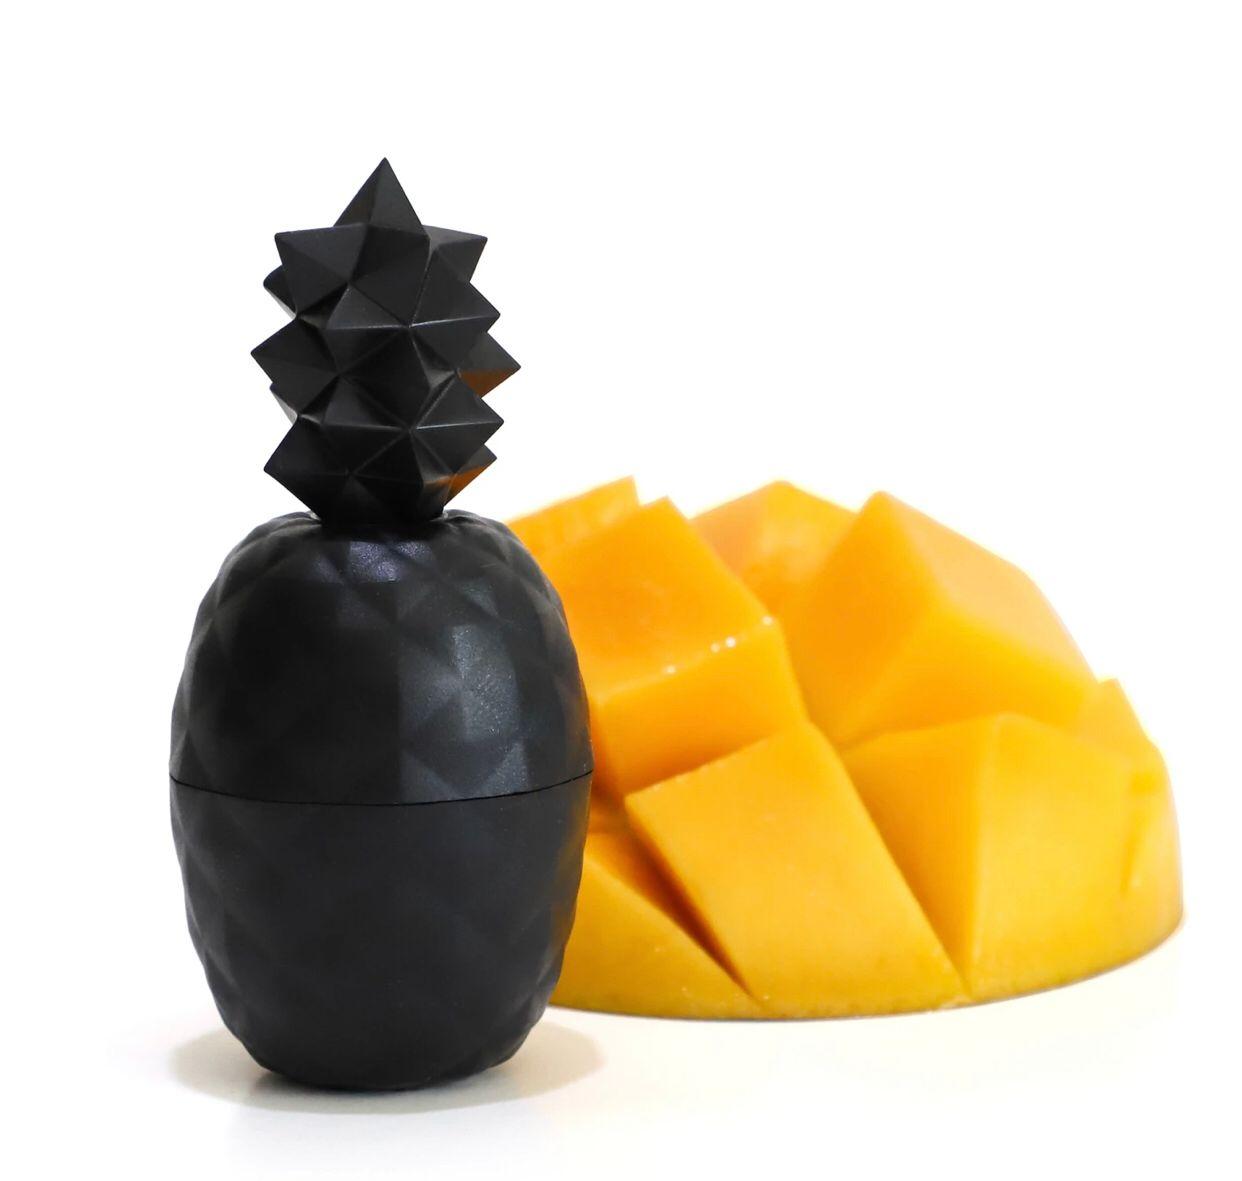 1-Piece Pineapple-Shaped Lip Balm - Exotic Fruit Flavor, Black